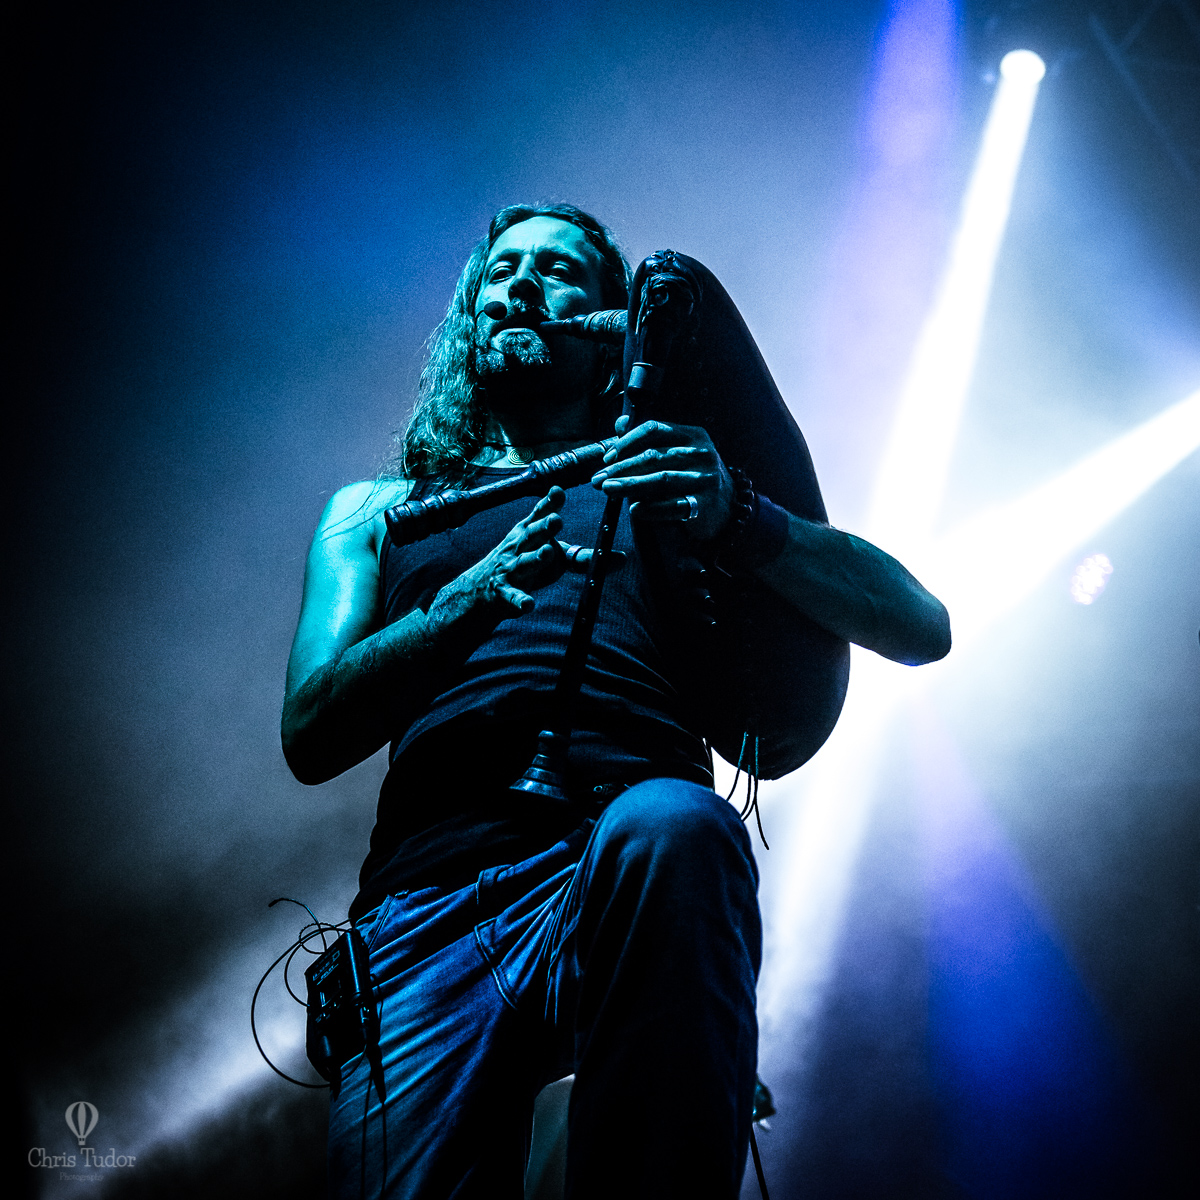 cristina-tudor-concert-75.jpg